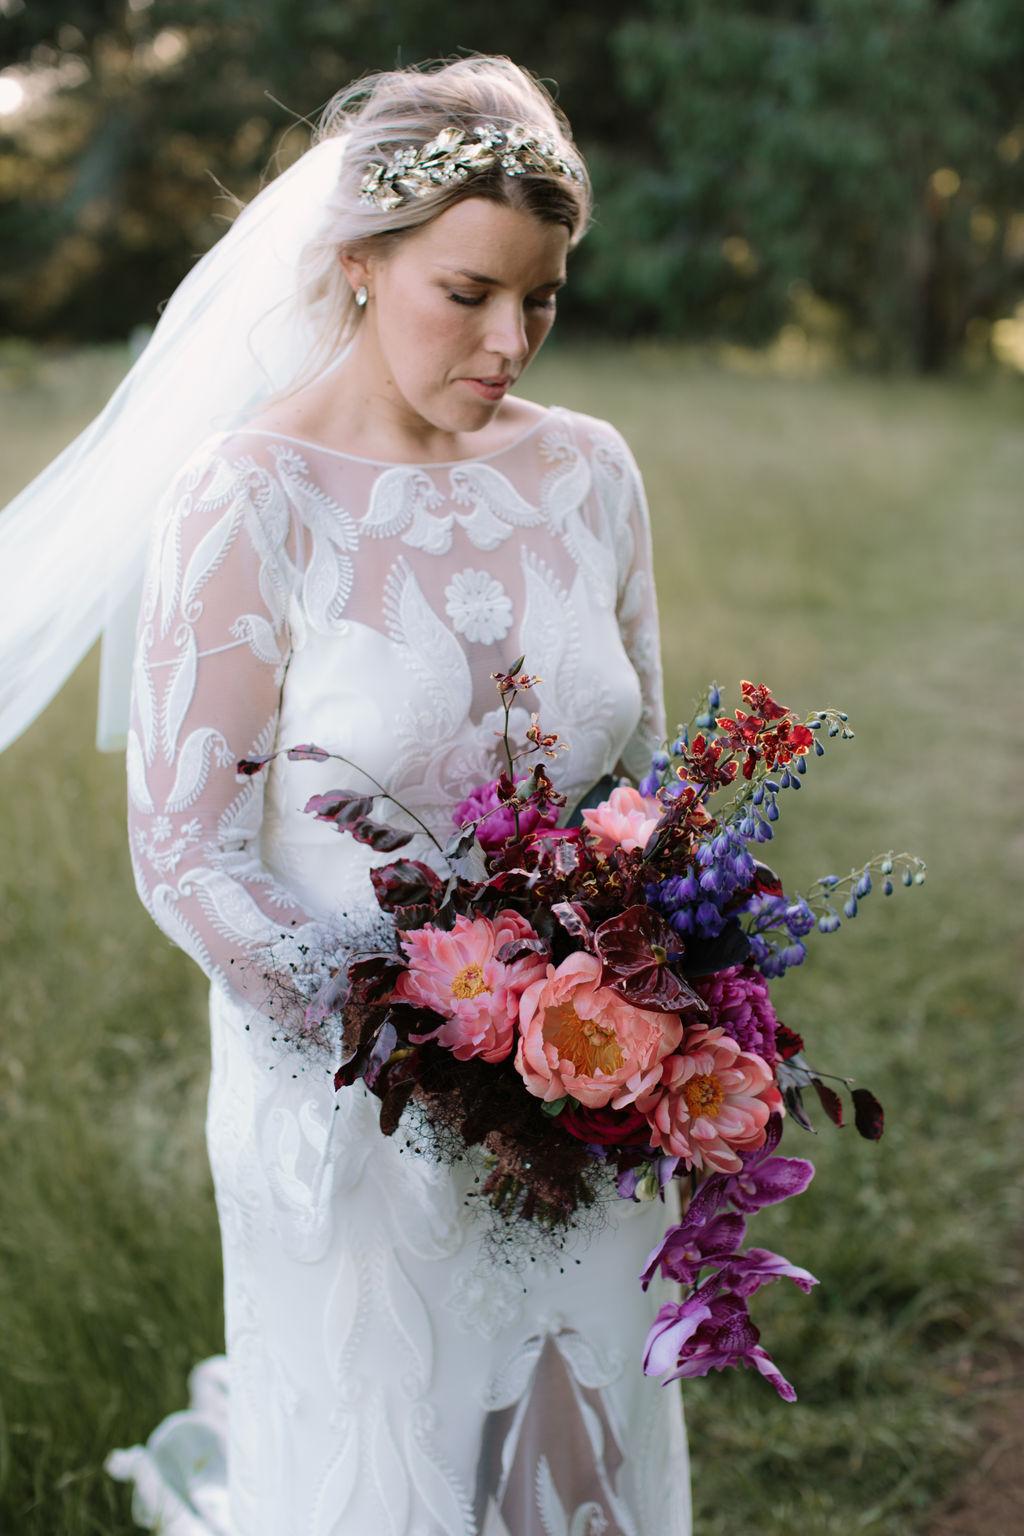 I-Got-You-Babe-Weddings-Erin-Dave744.JPG